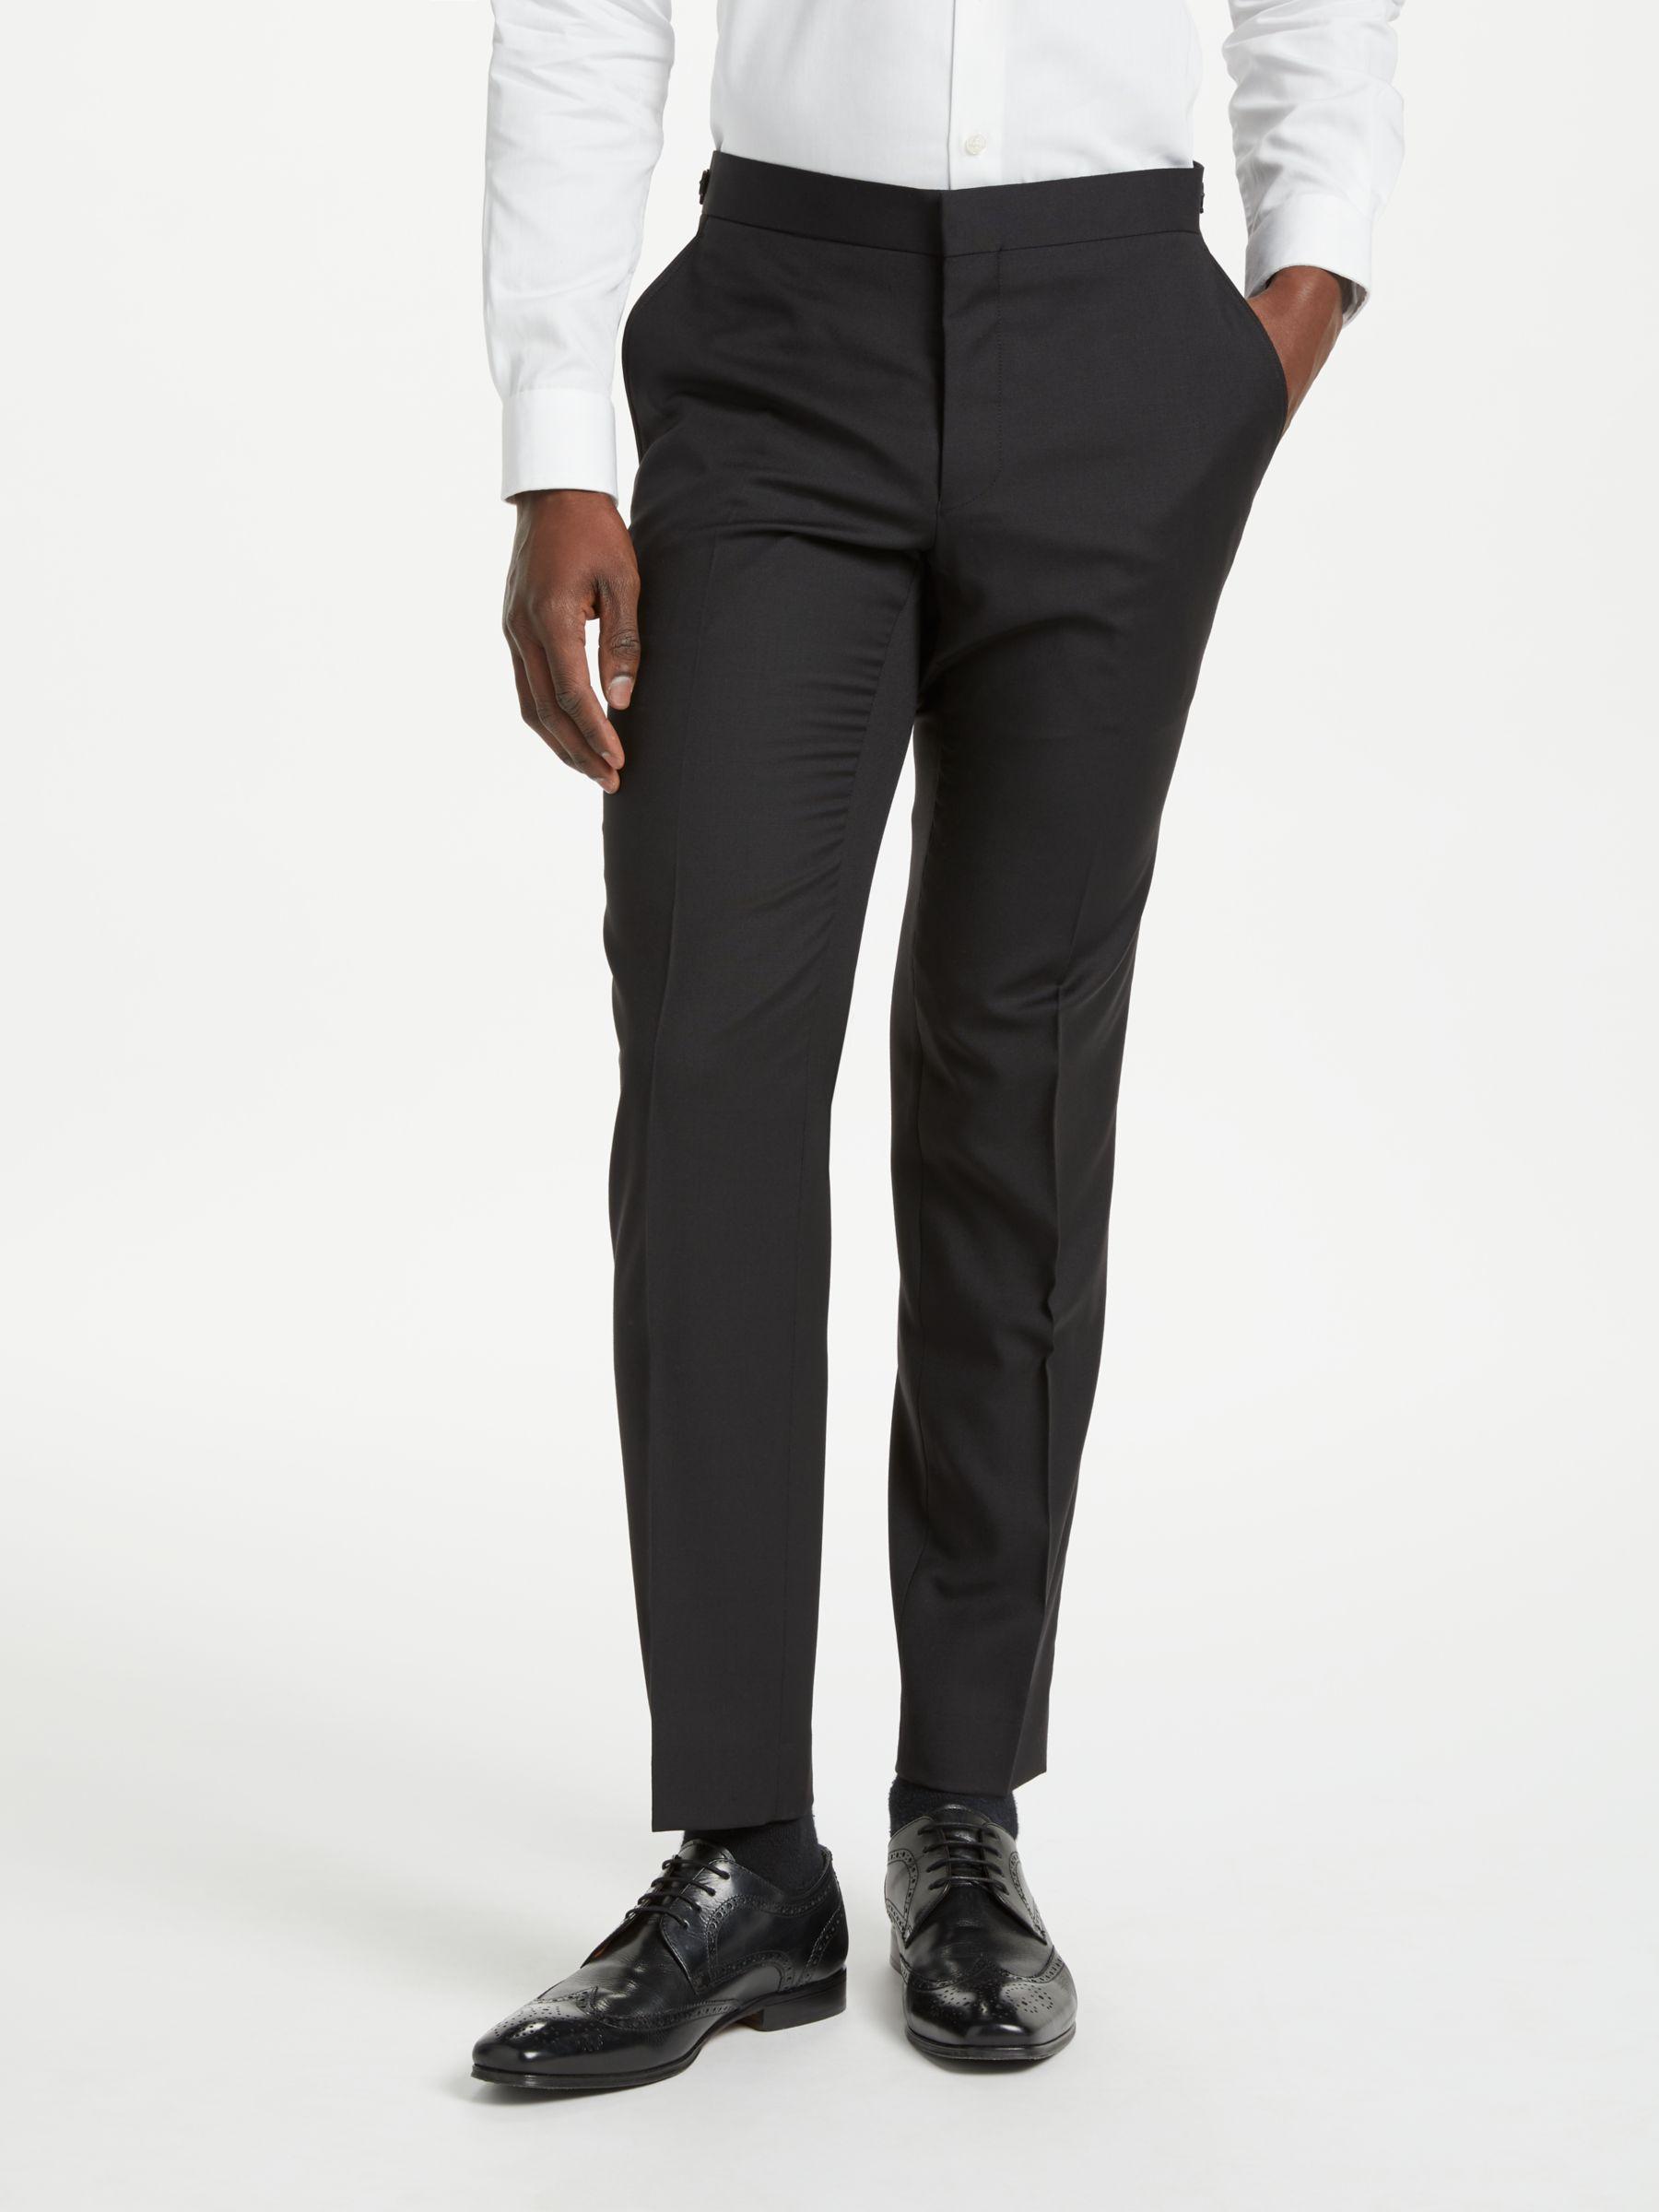 Richard James Mayfair Richard James Mayfair Hopsack Wool Dress Suit Trousers, Black